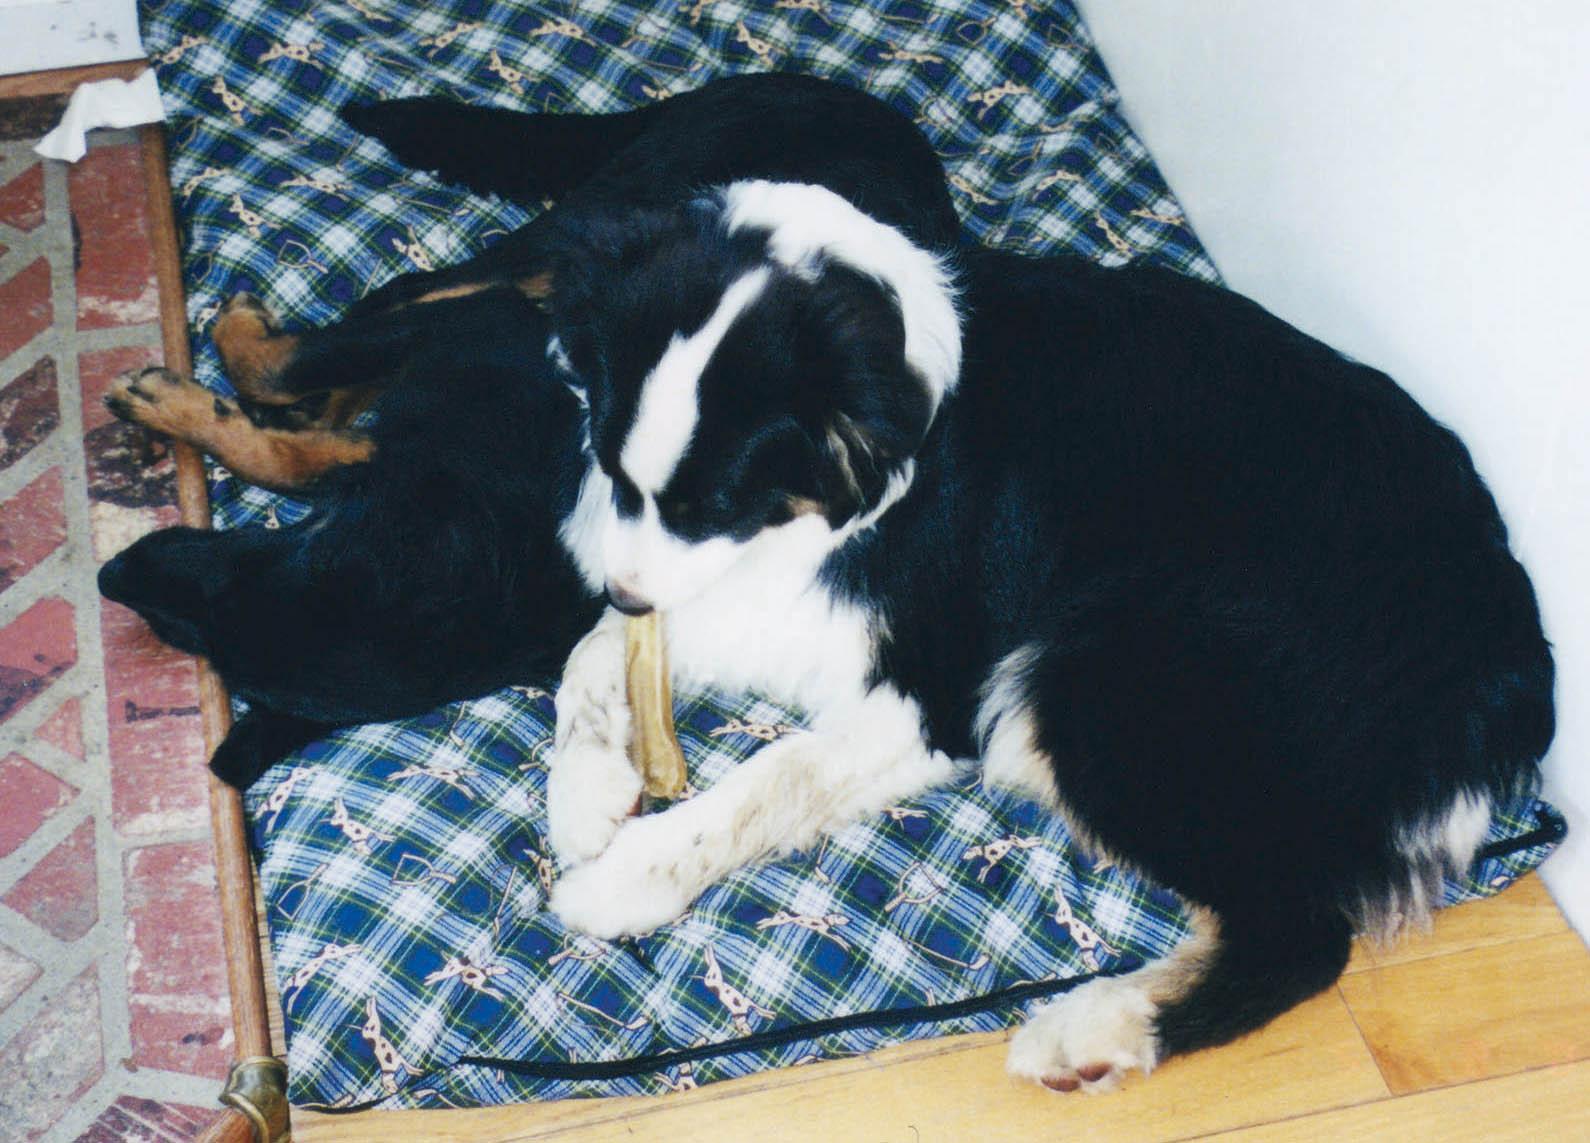 Kiera and Magic-- The Snuggle Bunnies